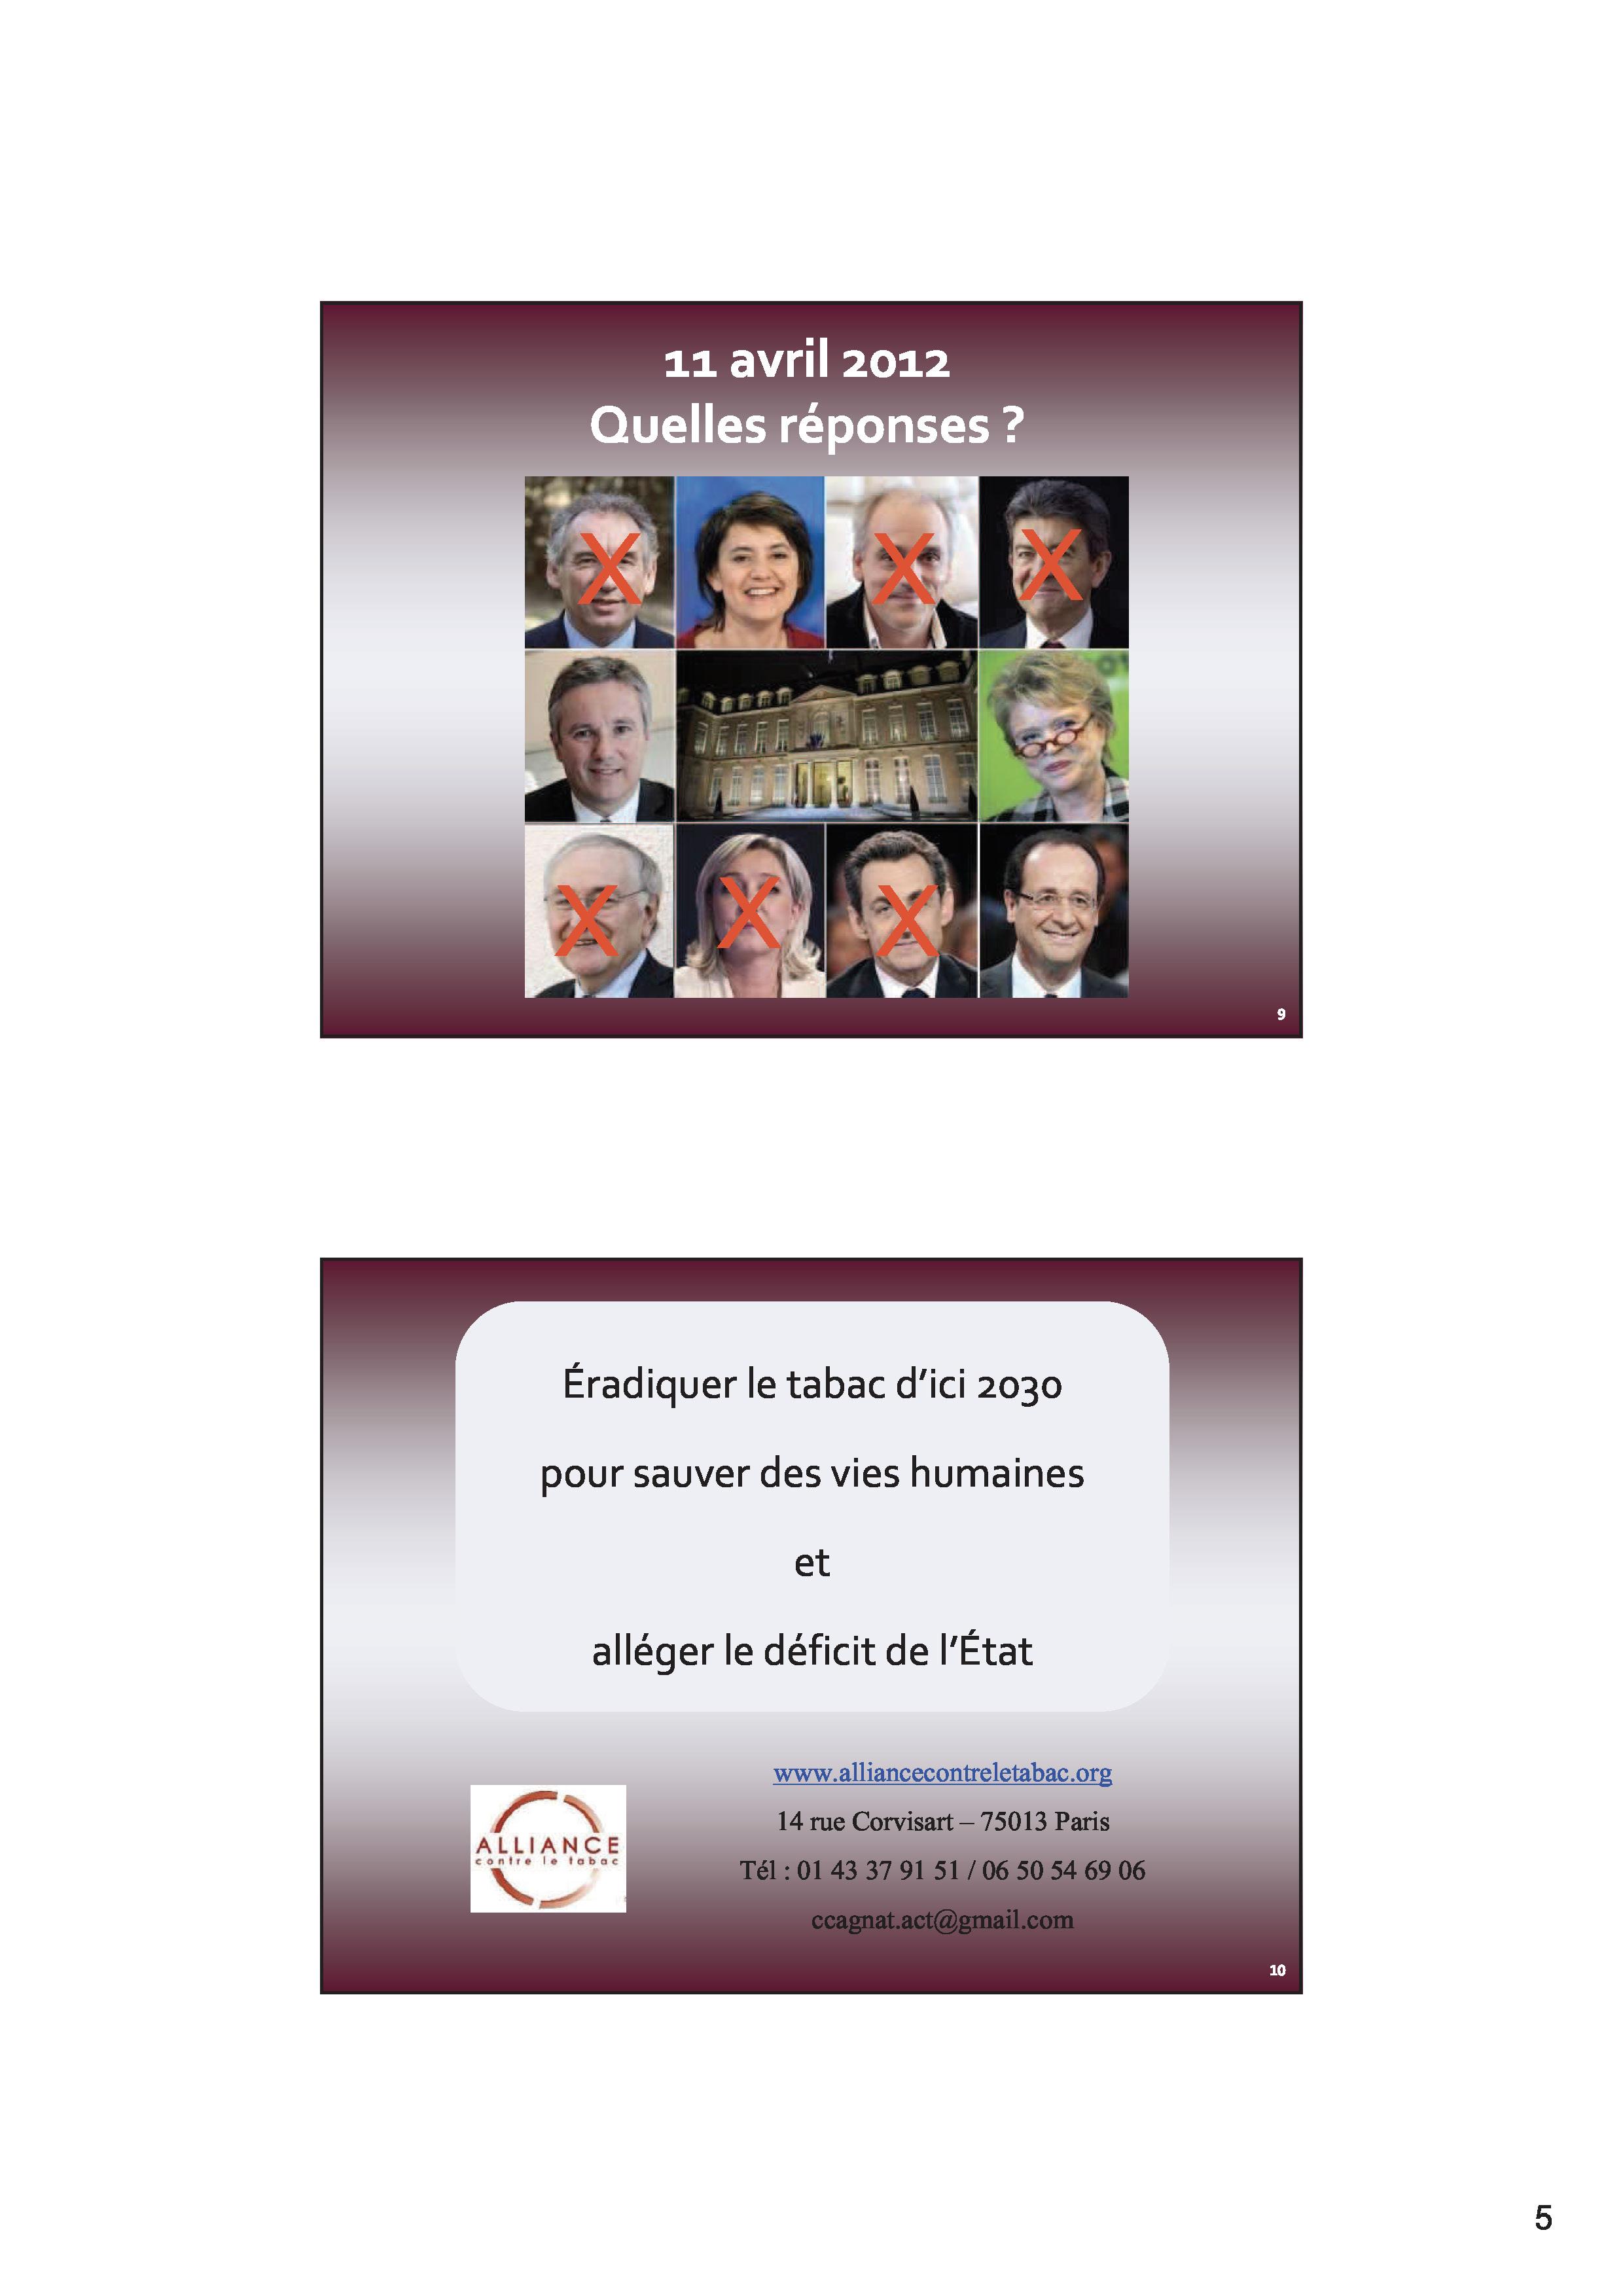 Alliance-dossier-presse-livre-blanc-11avr2012_Page_10.jpg